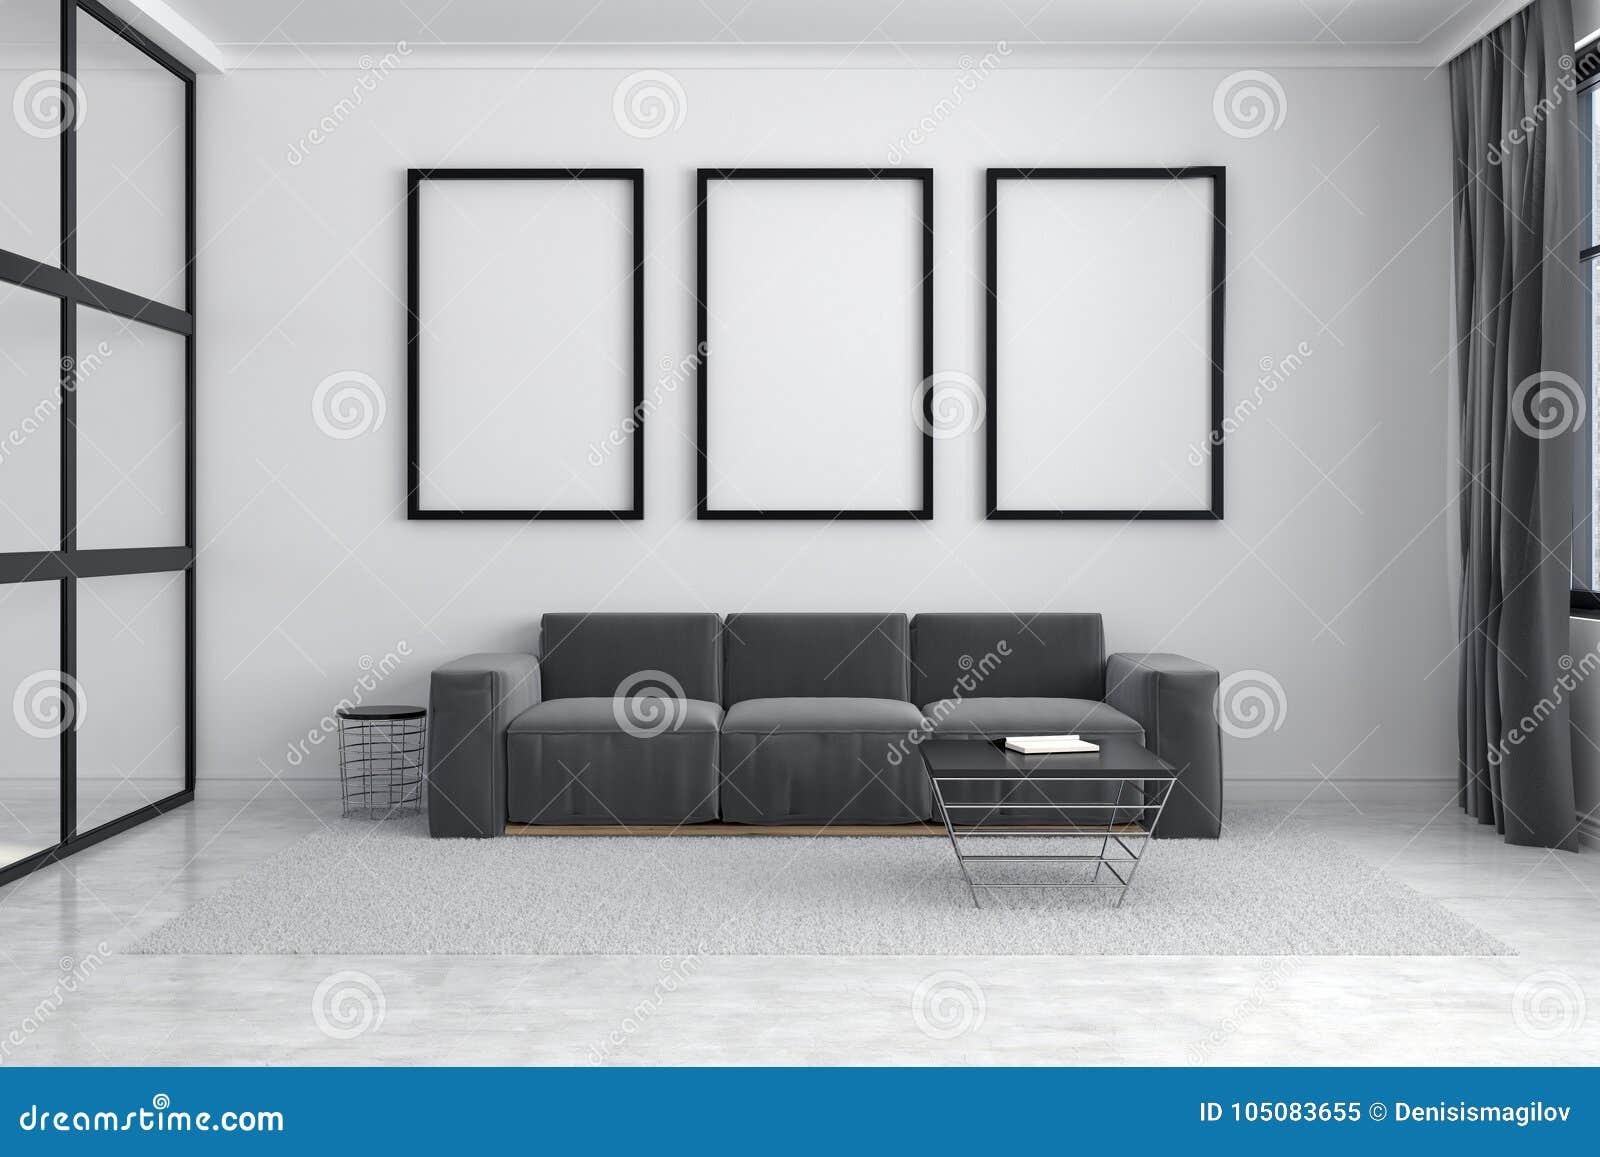 Gray sofa, poster gallery stock illustration. Illustration of ...